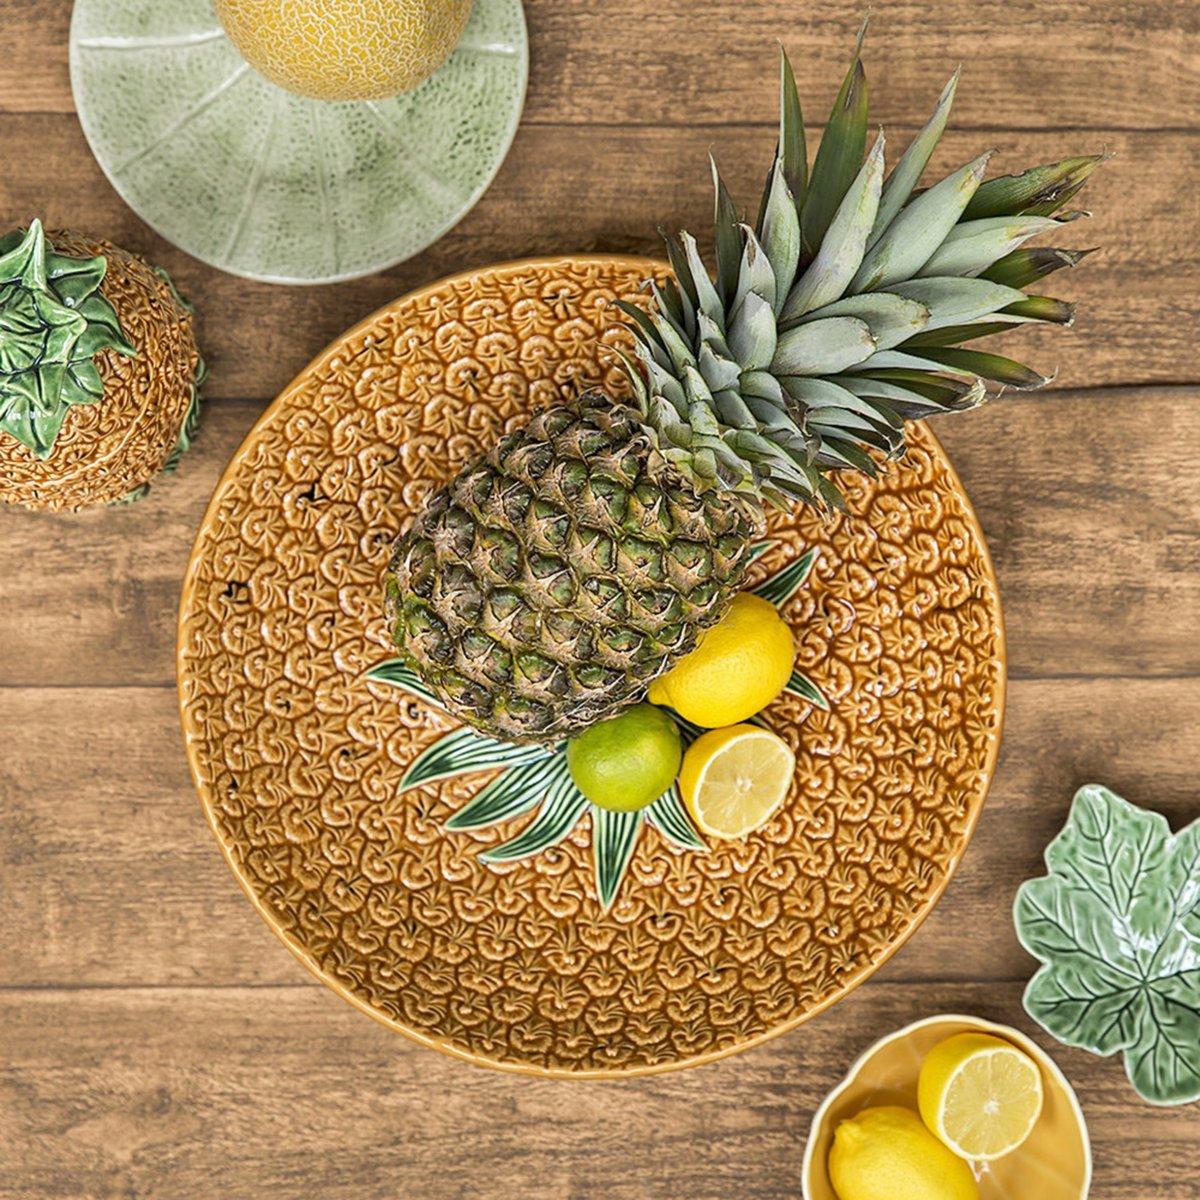 Pineapple in Situ